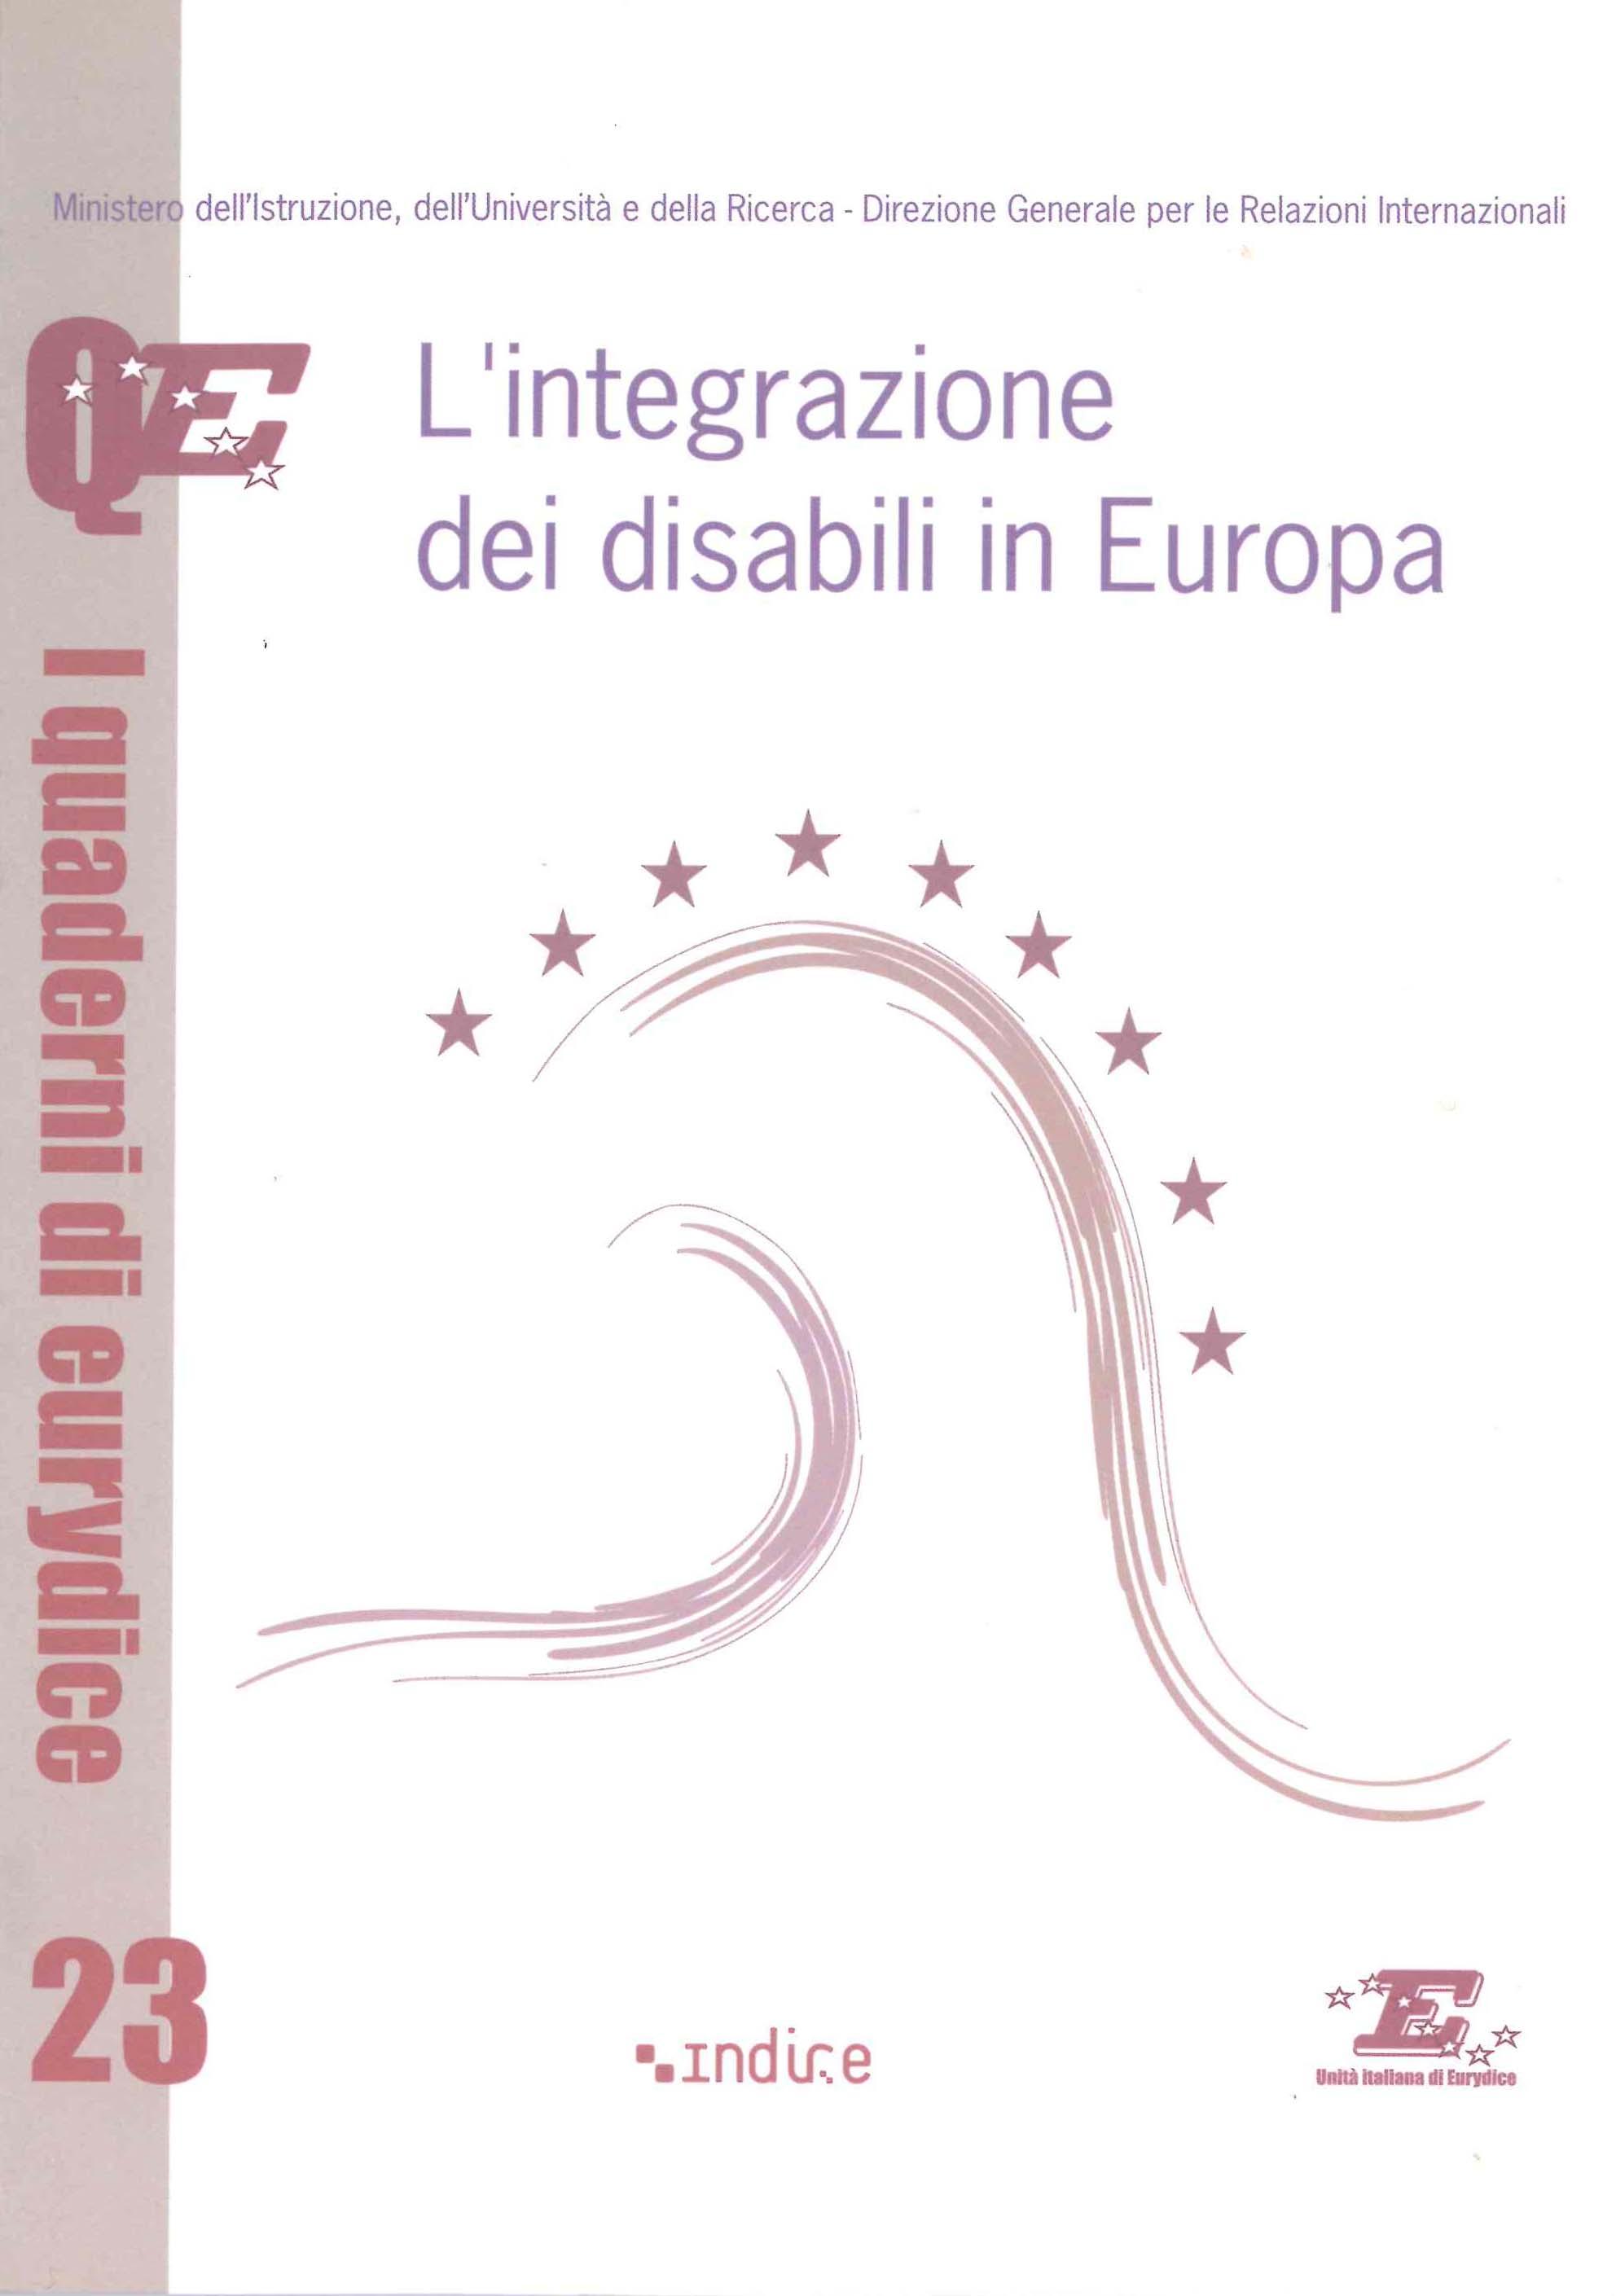 copertina_integrazione_disabili_2004